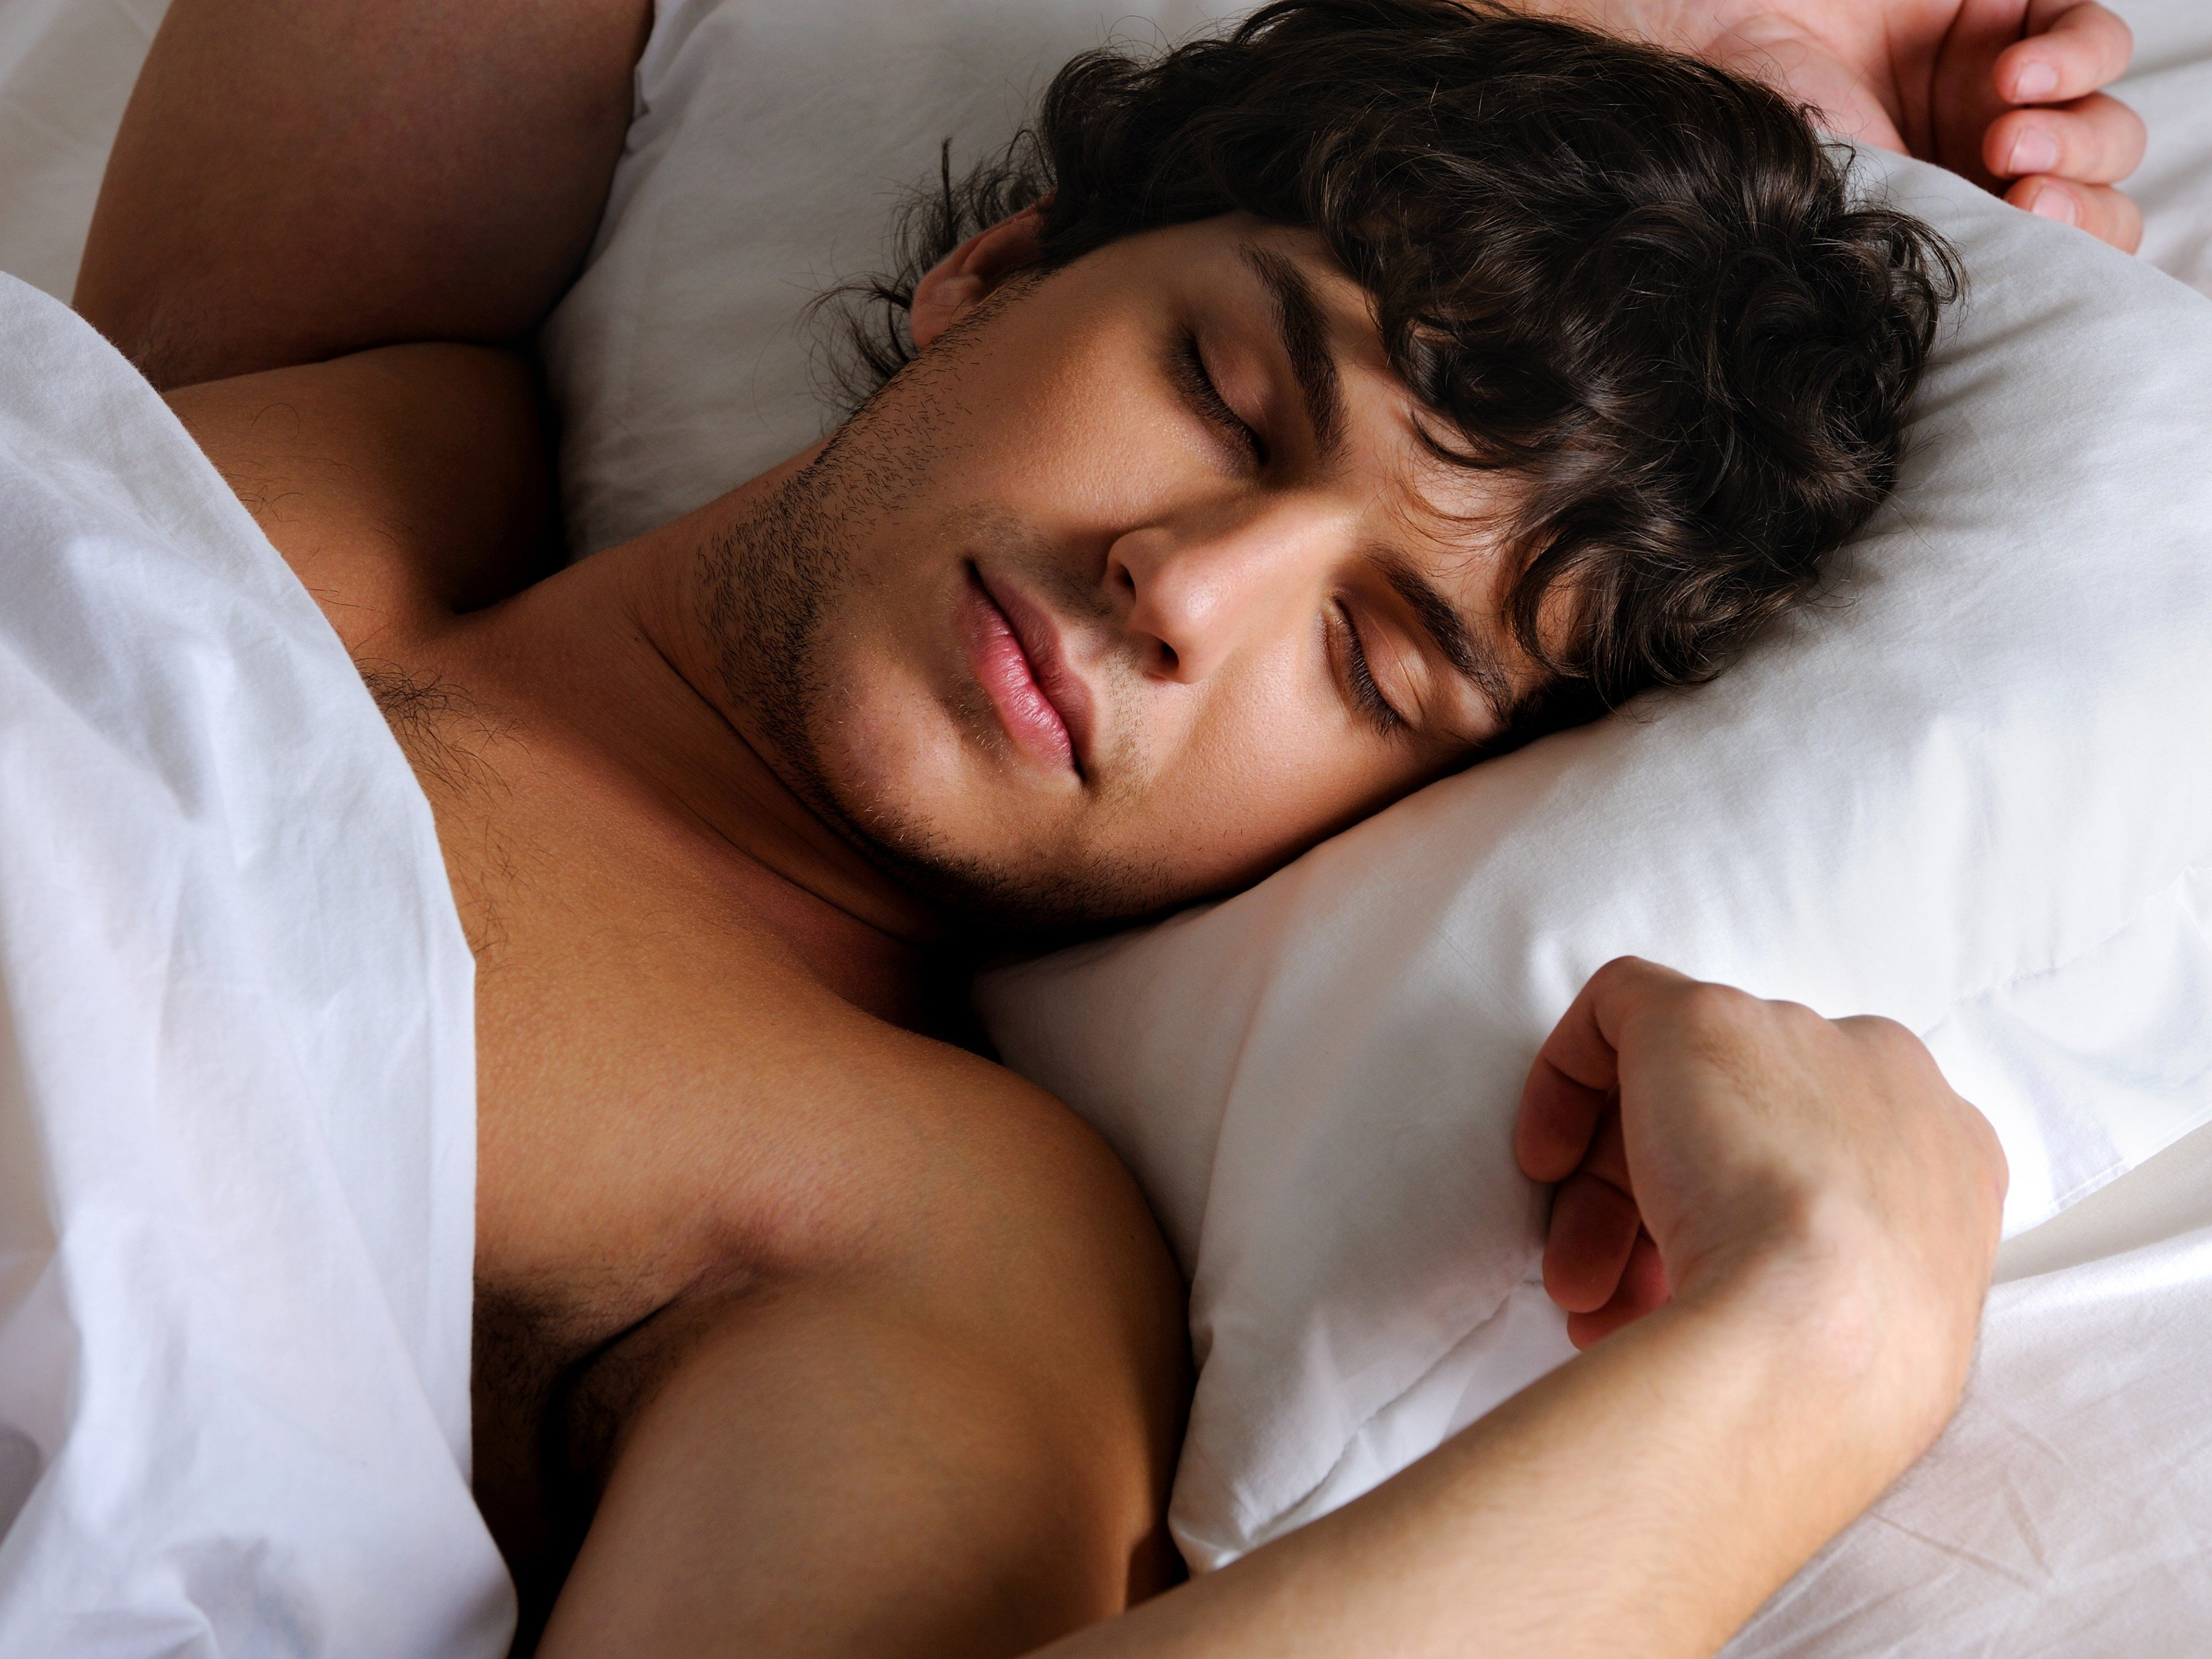 1. Sleep off a stiff neck